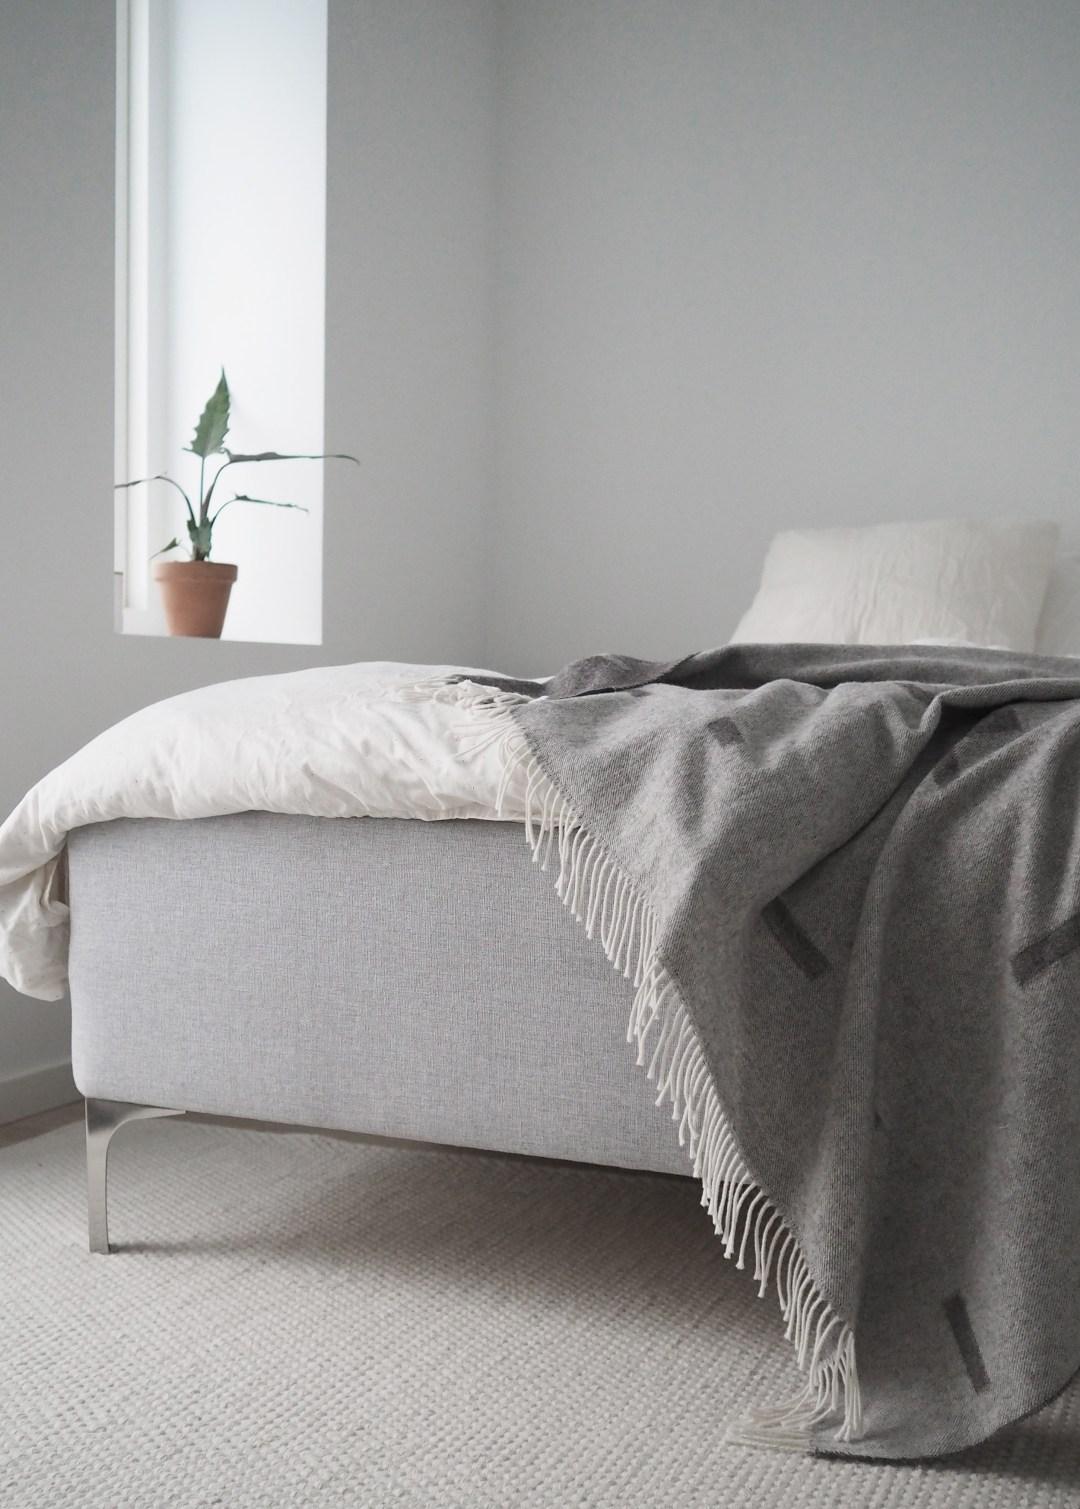 Minimalist bedroom, Dunlopillo bed